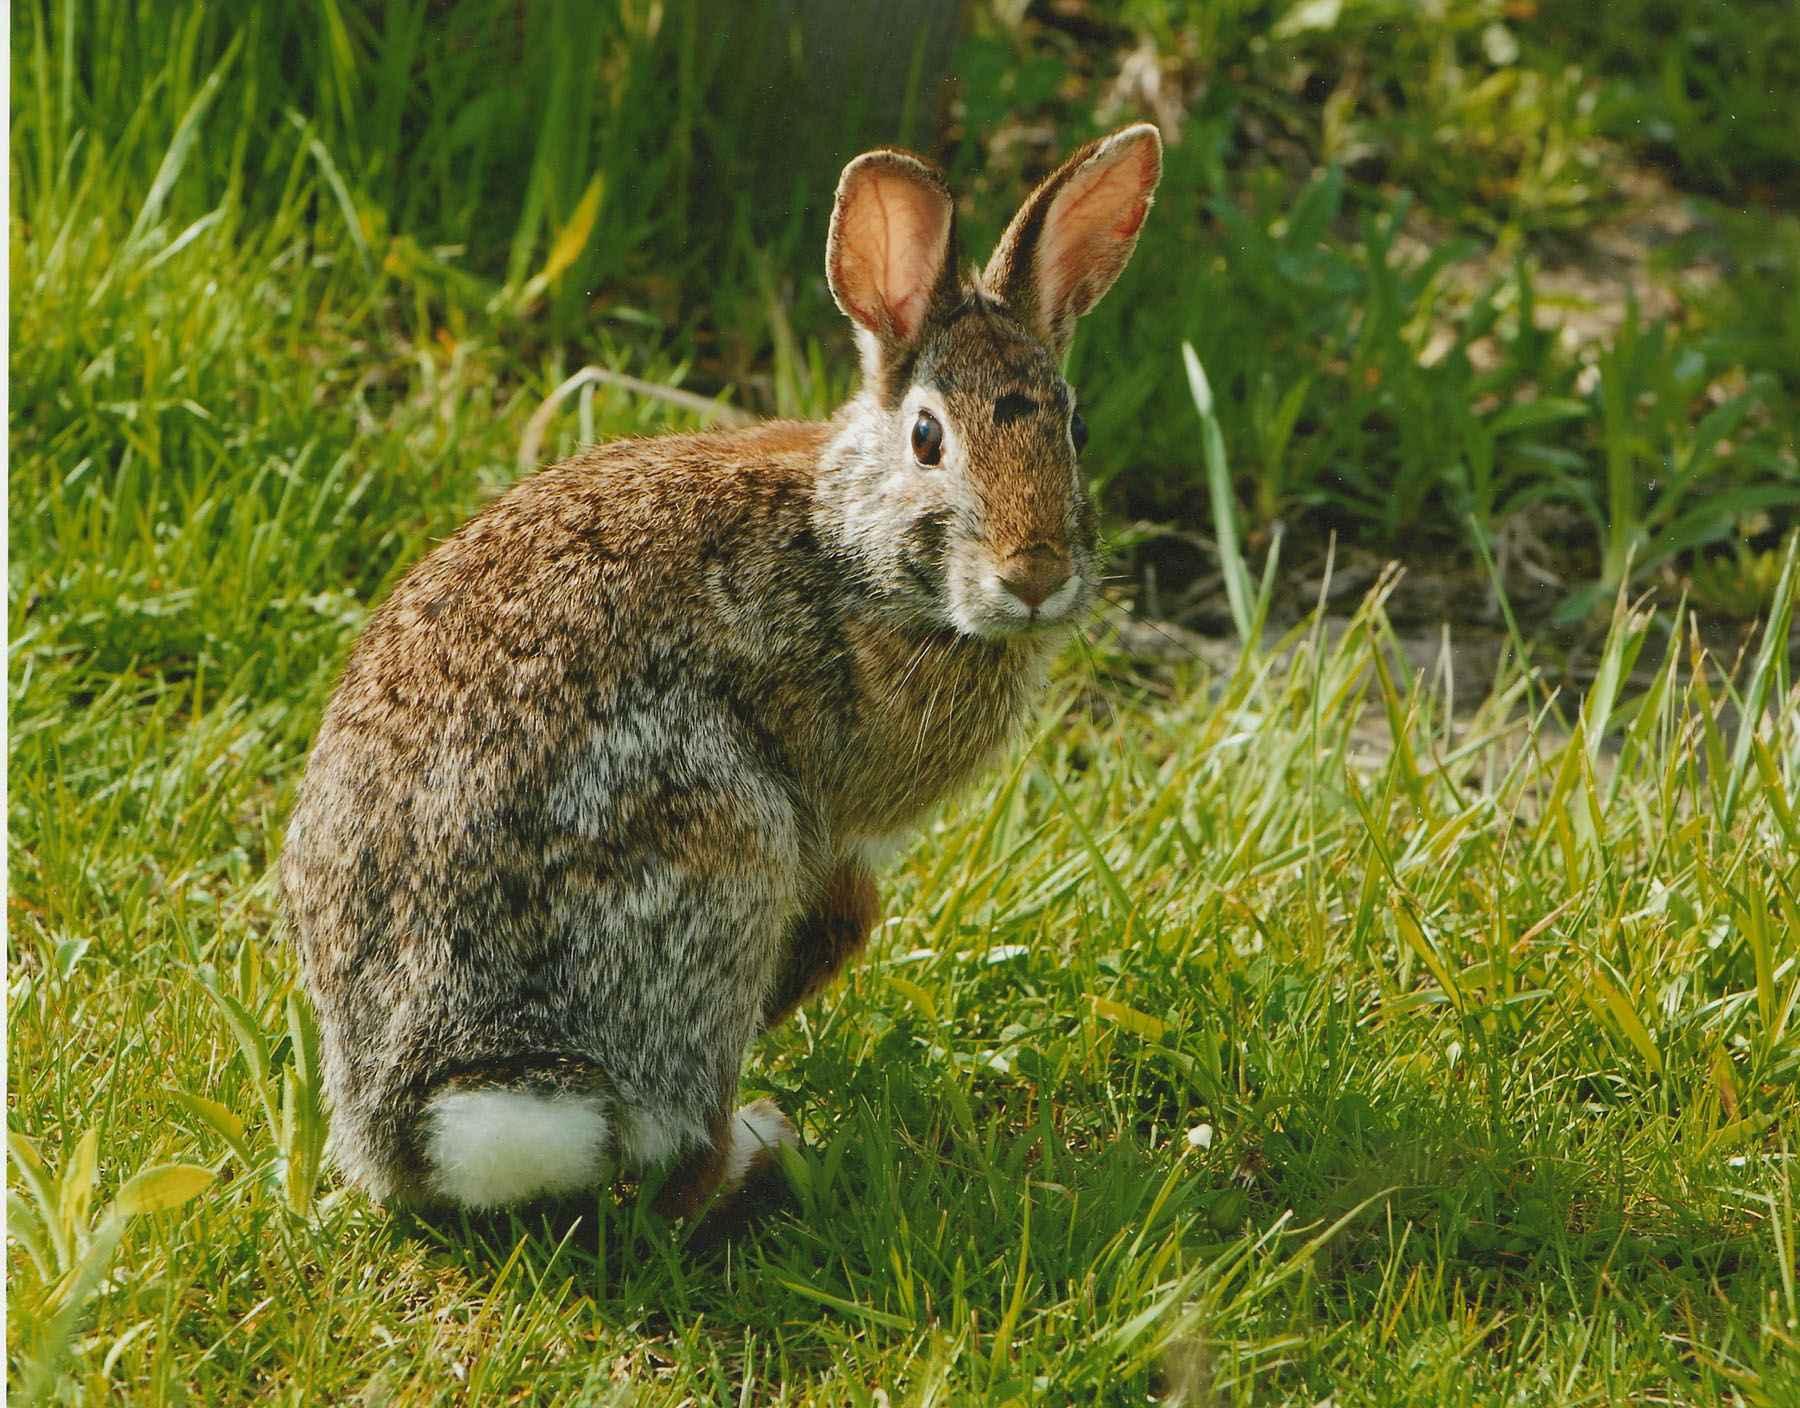 eastern-cottonail-rabbit-close-up-sylvilagus-floridanus.jpg